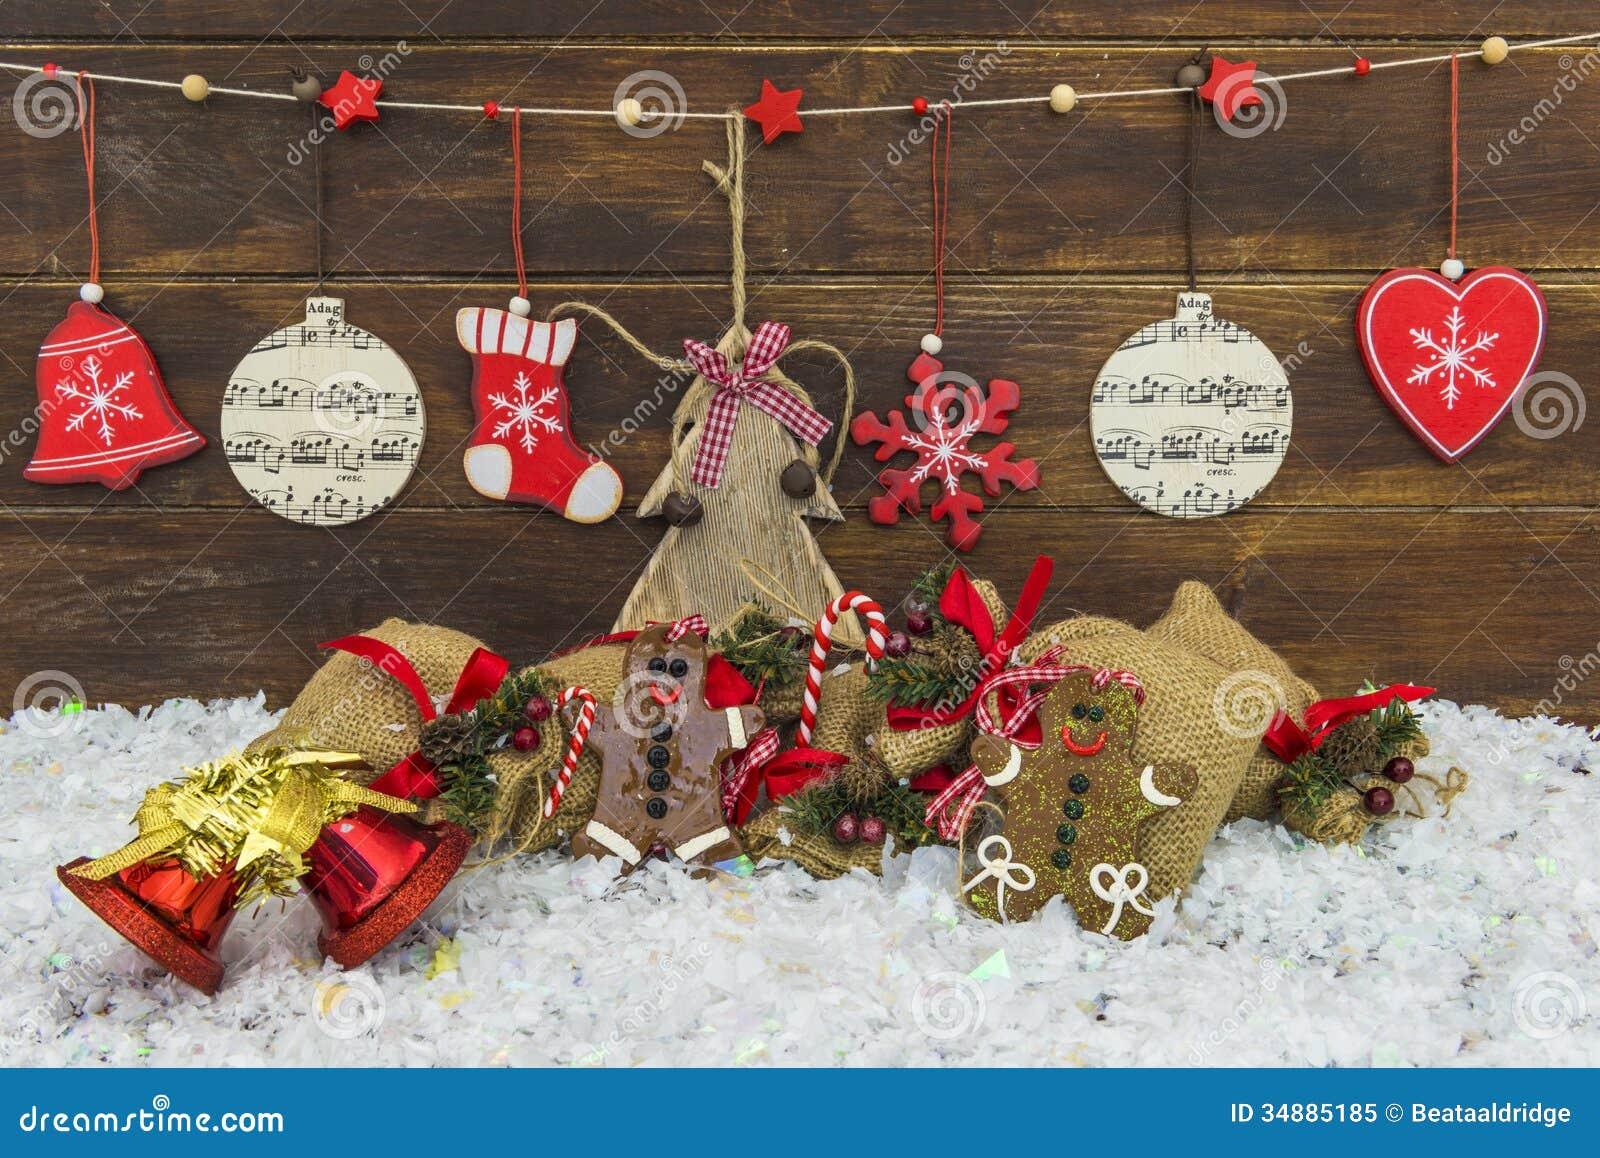 #AB2024 Shabby Chic Rustic Christmas Decorations Royalty Free  5509 decorations de noel shabby 1300x958 px @ aertt.com